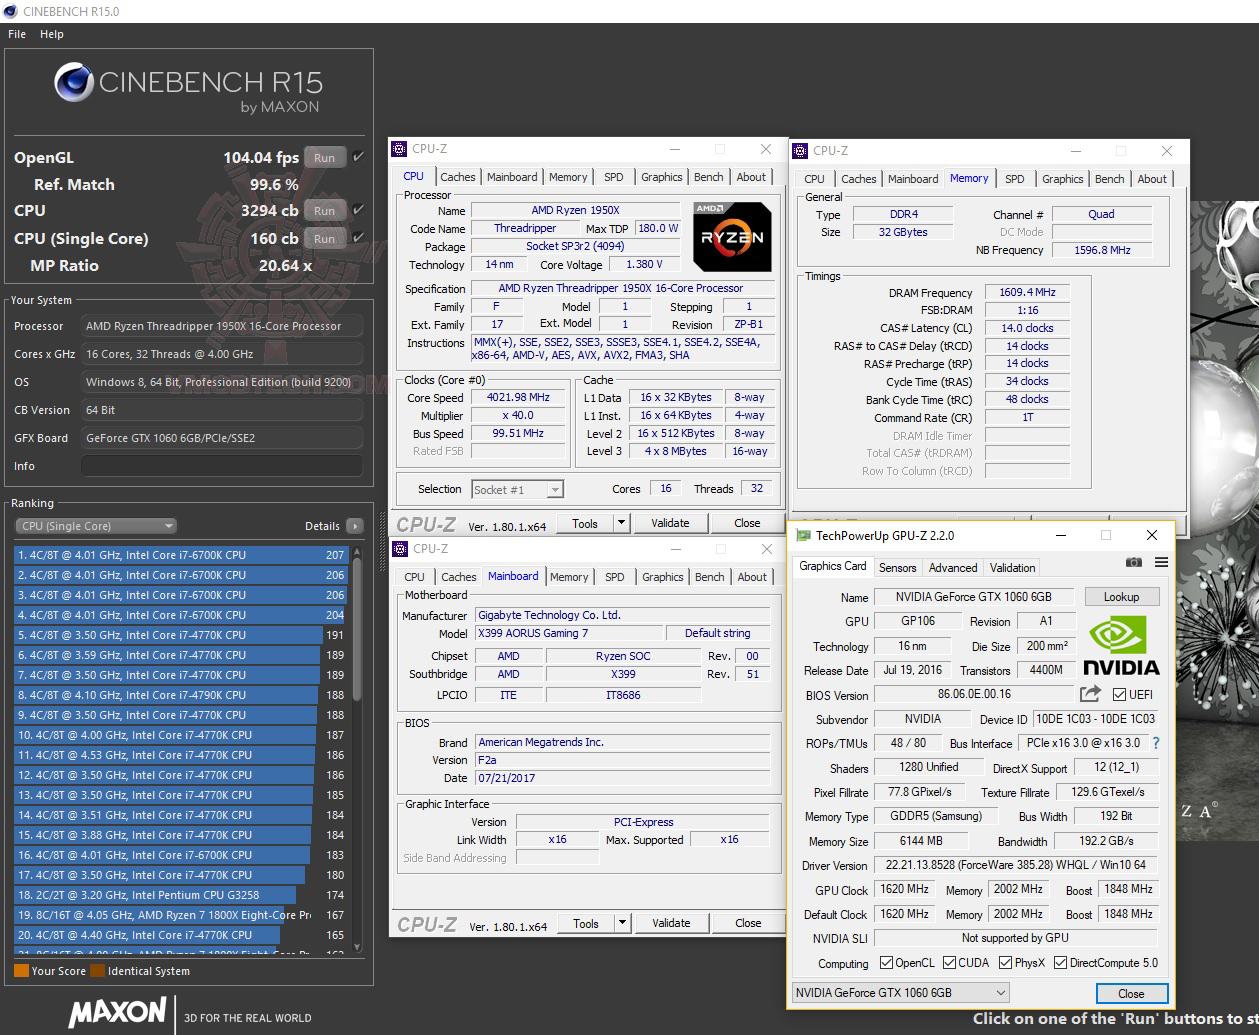 c15 G.SKILL Trident Z RGB DDR4 3200MHz 32GB (8GBx4) Quad Channel Review